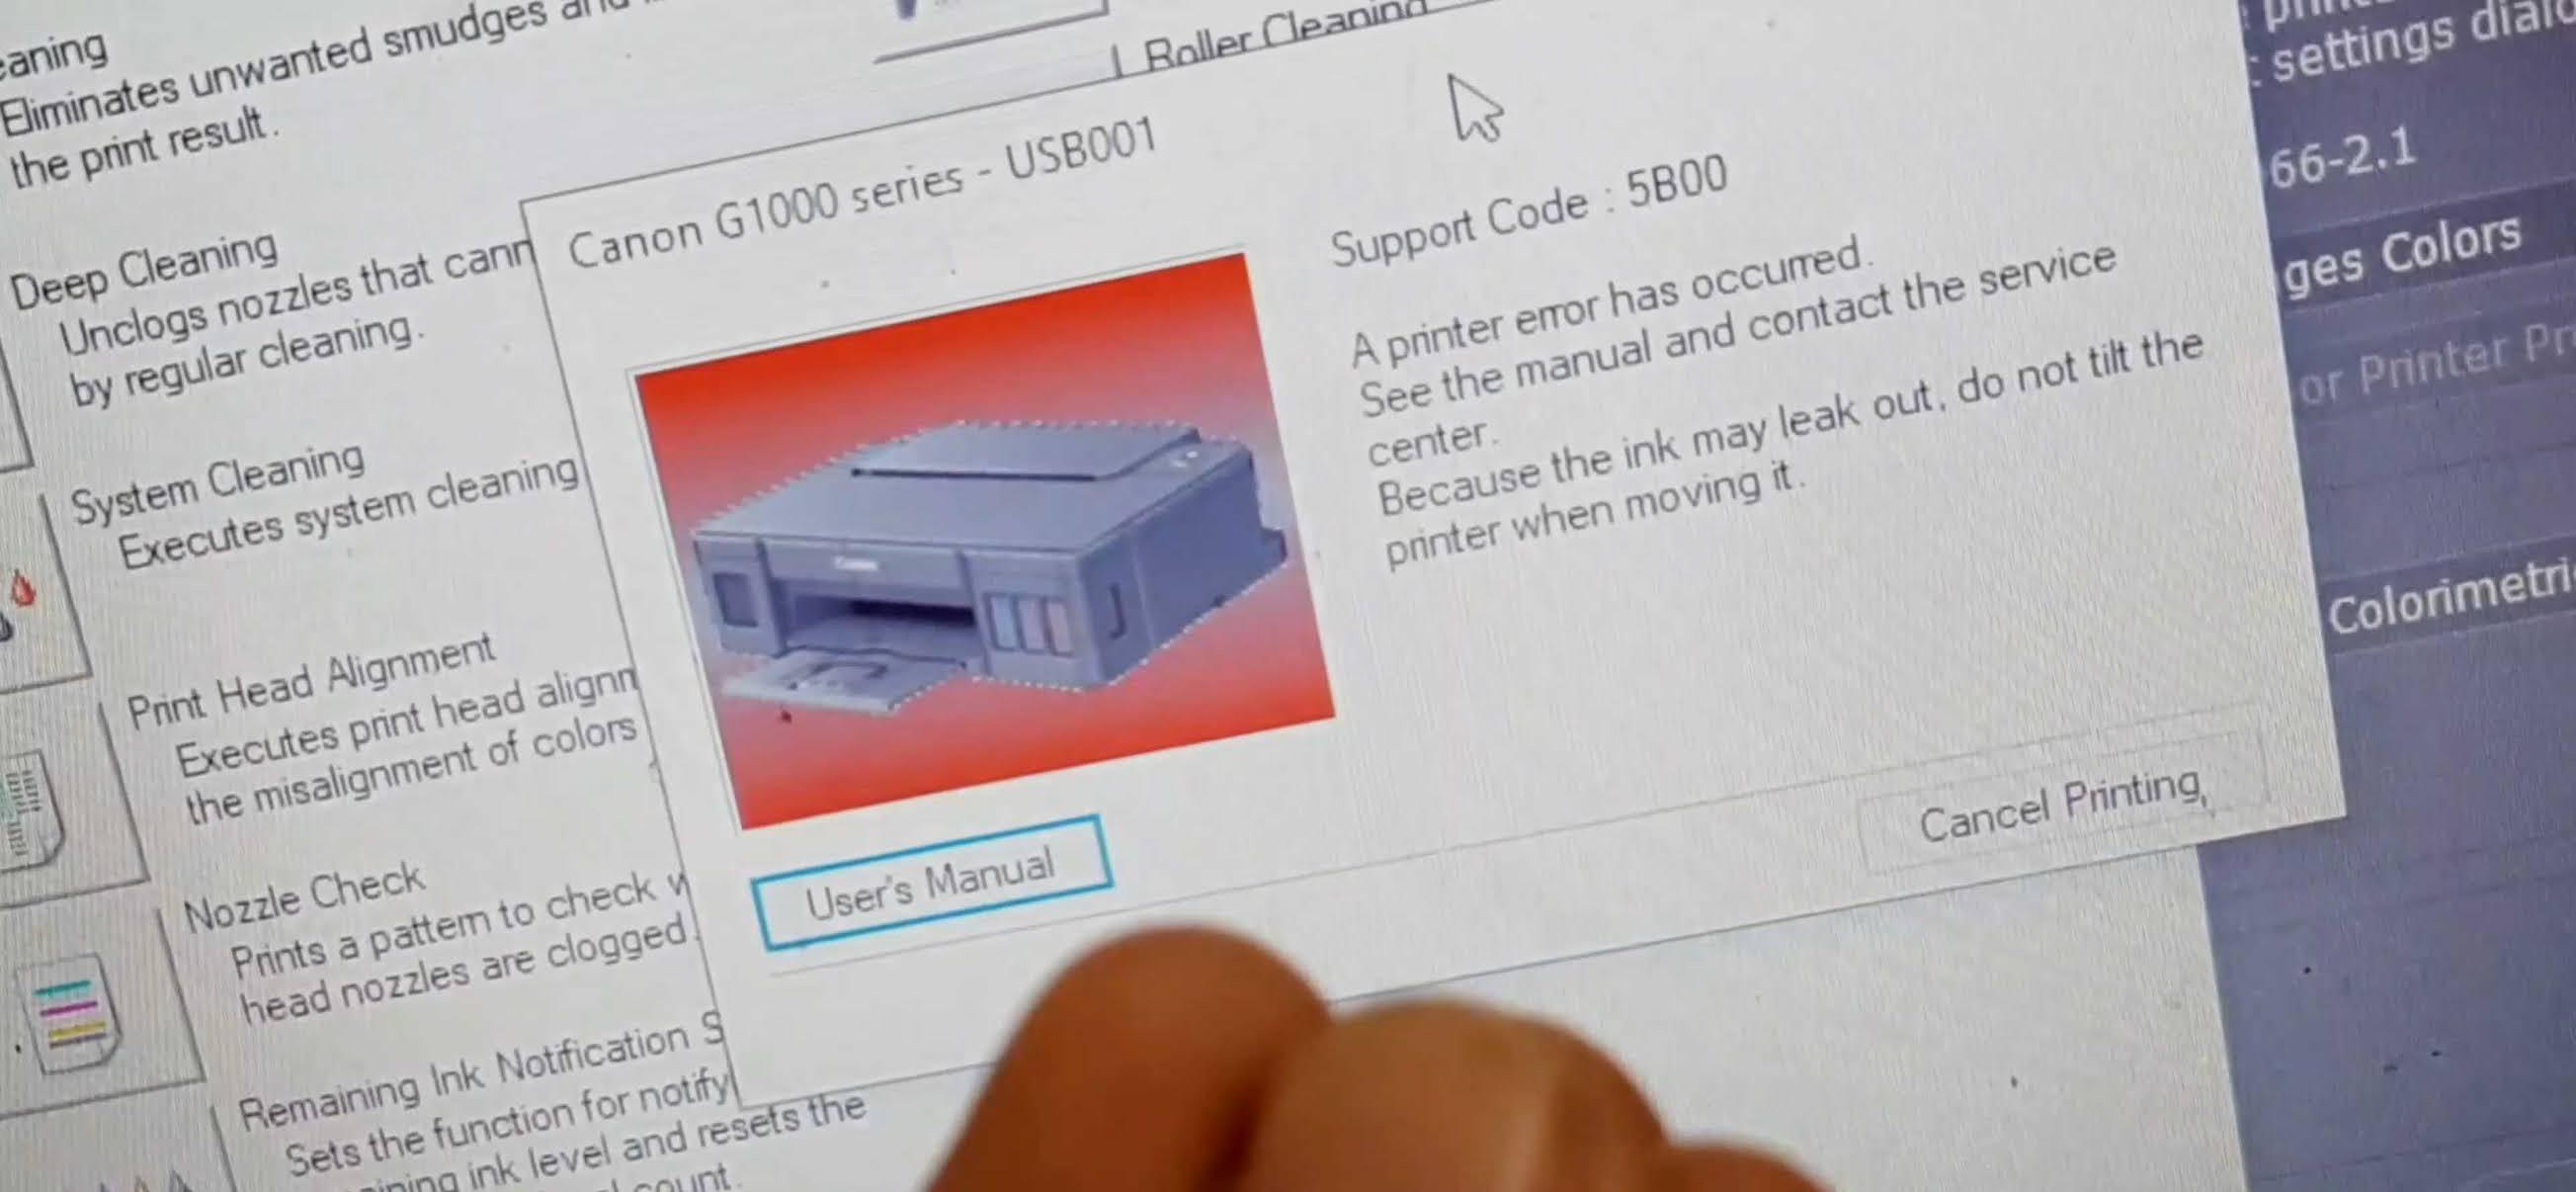 Cara Memperbaiki Printer G1000 G2000 Error 5b00 Tanpa Software Rahmancyber